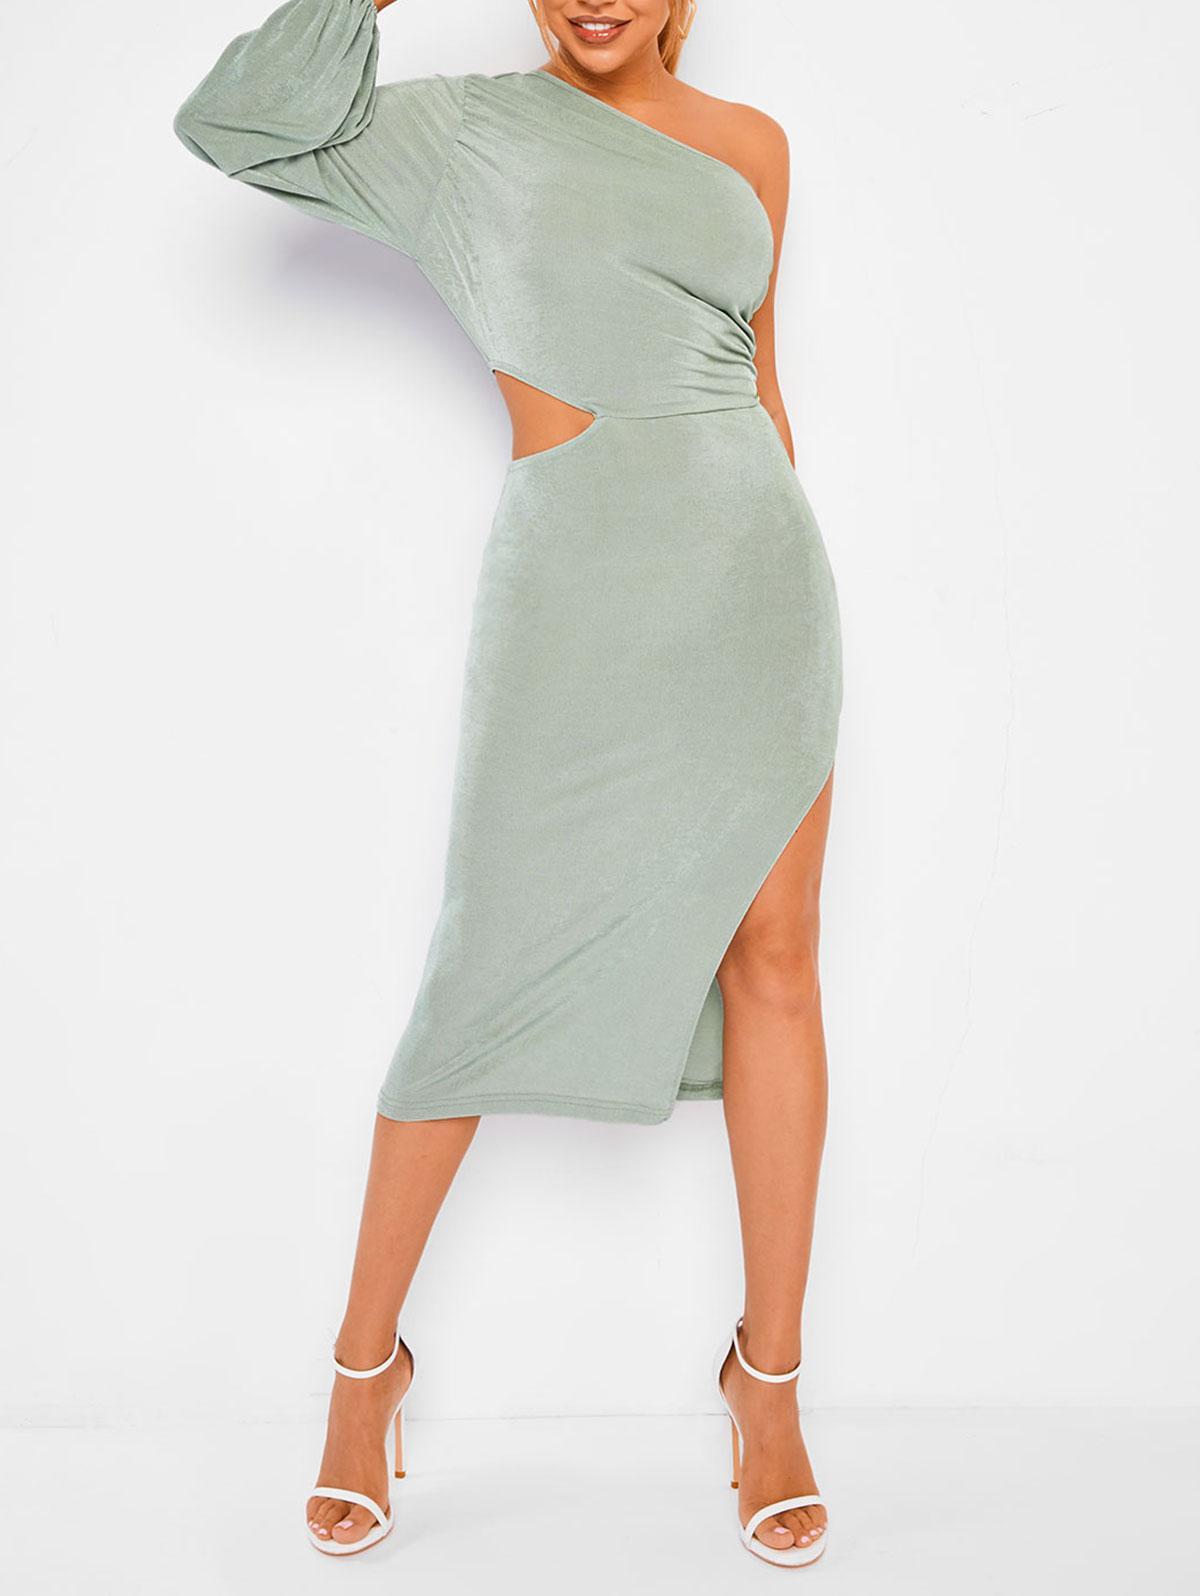 Ruched Cut Out One Shoulder Jersey Slit Dress